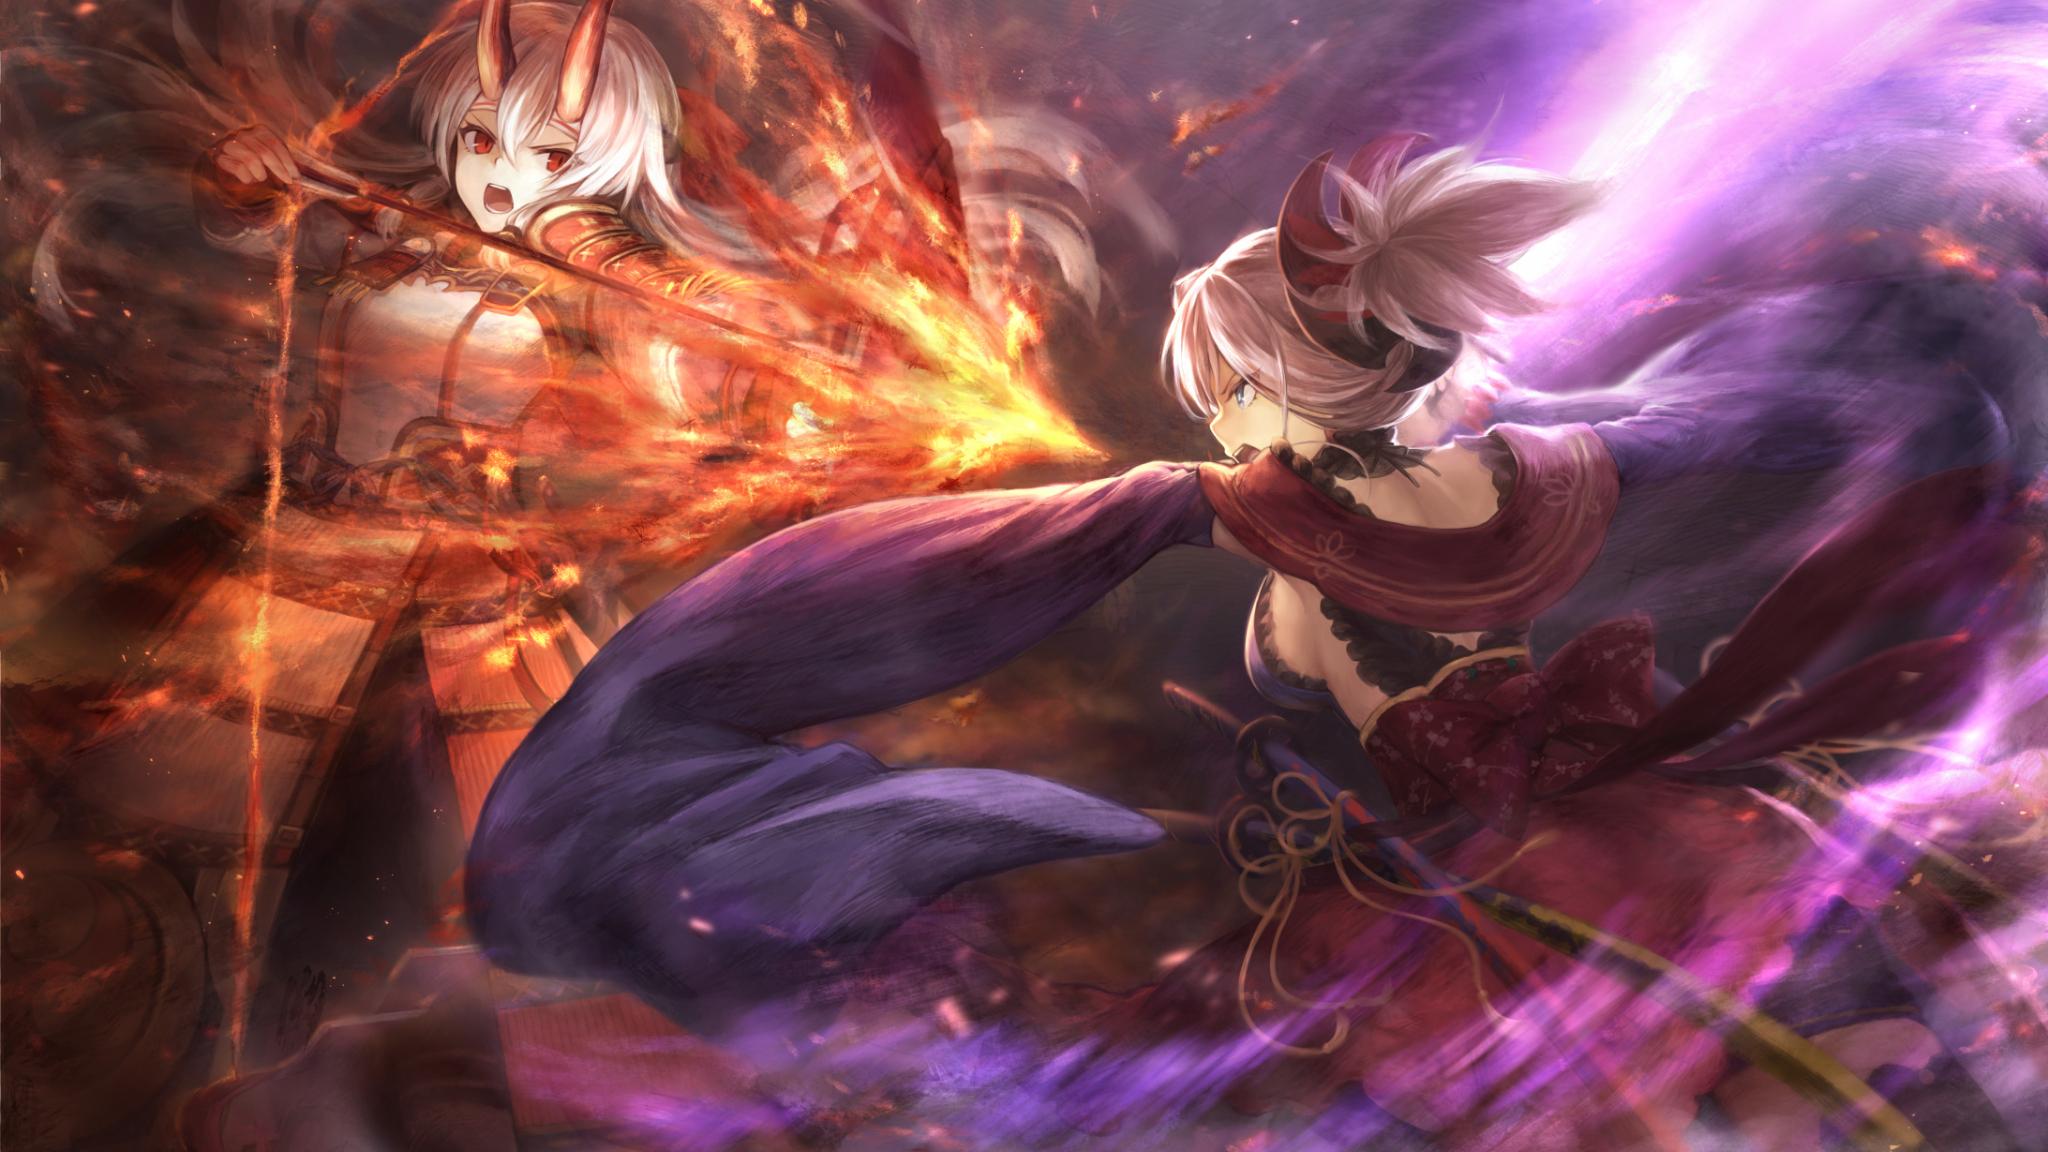 Desktop Wallpaper Anime Girls Archer Miyamoto Musashi Tomoe Gozen Fate Grand Order Hd Image Picture Background 3c29a6